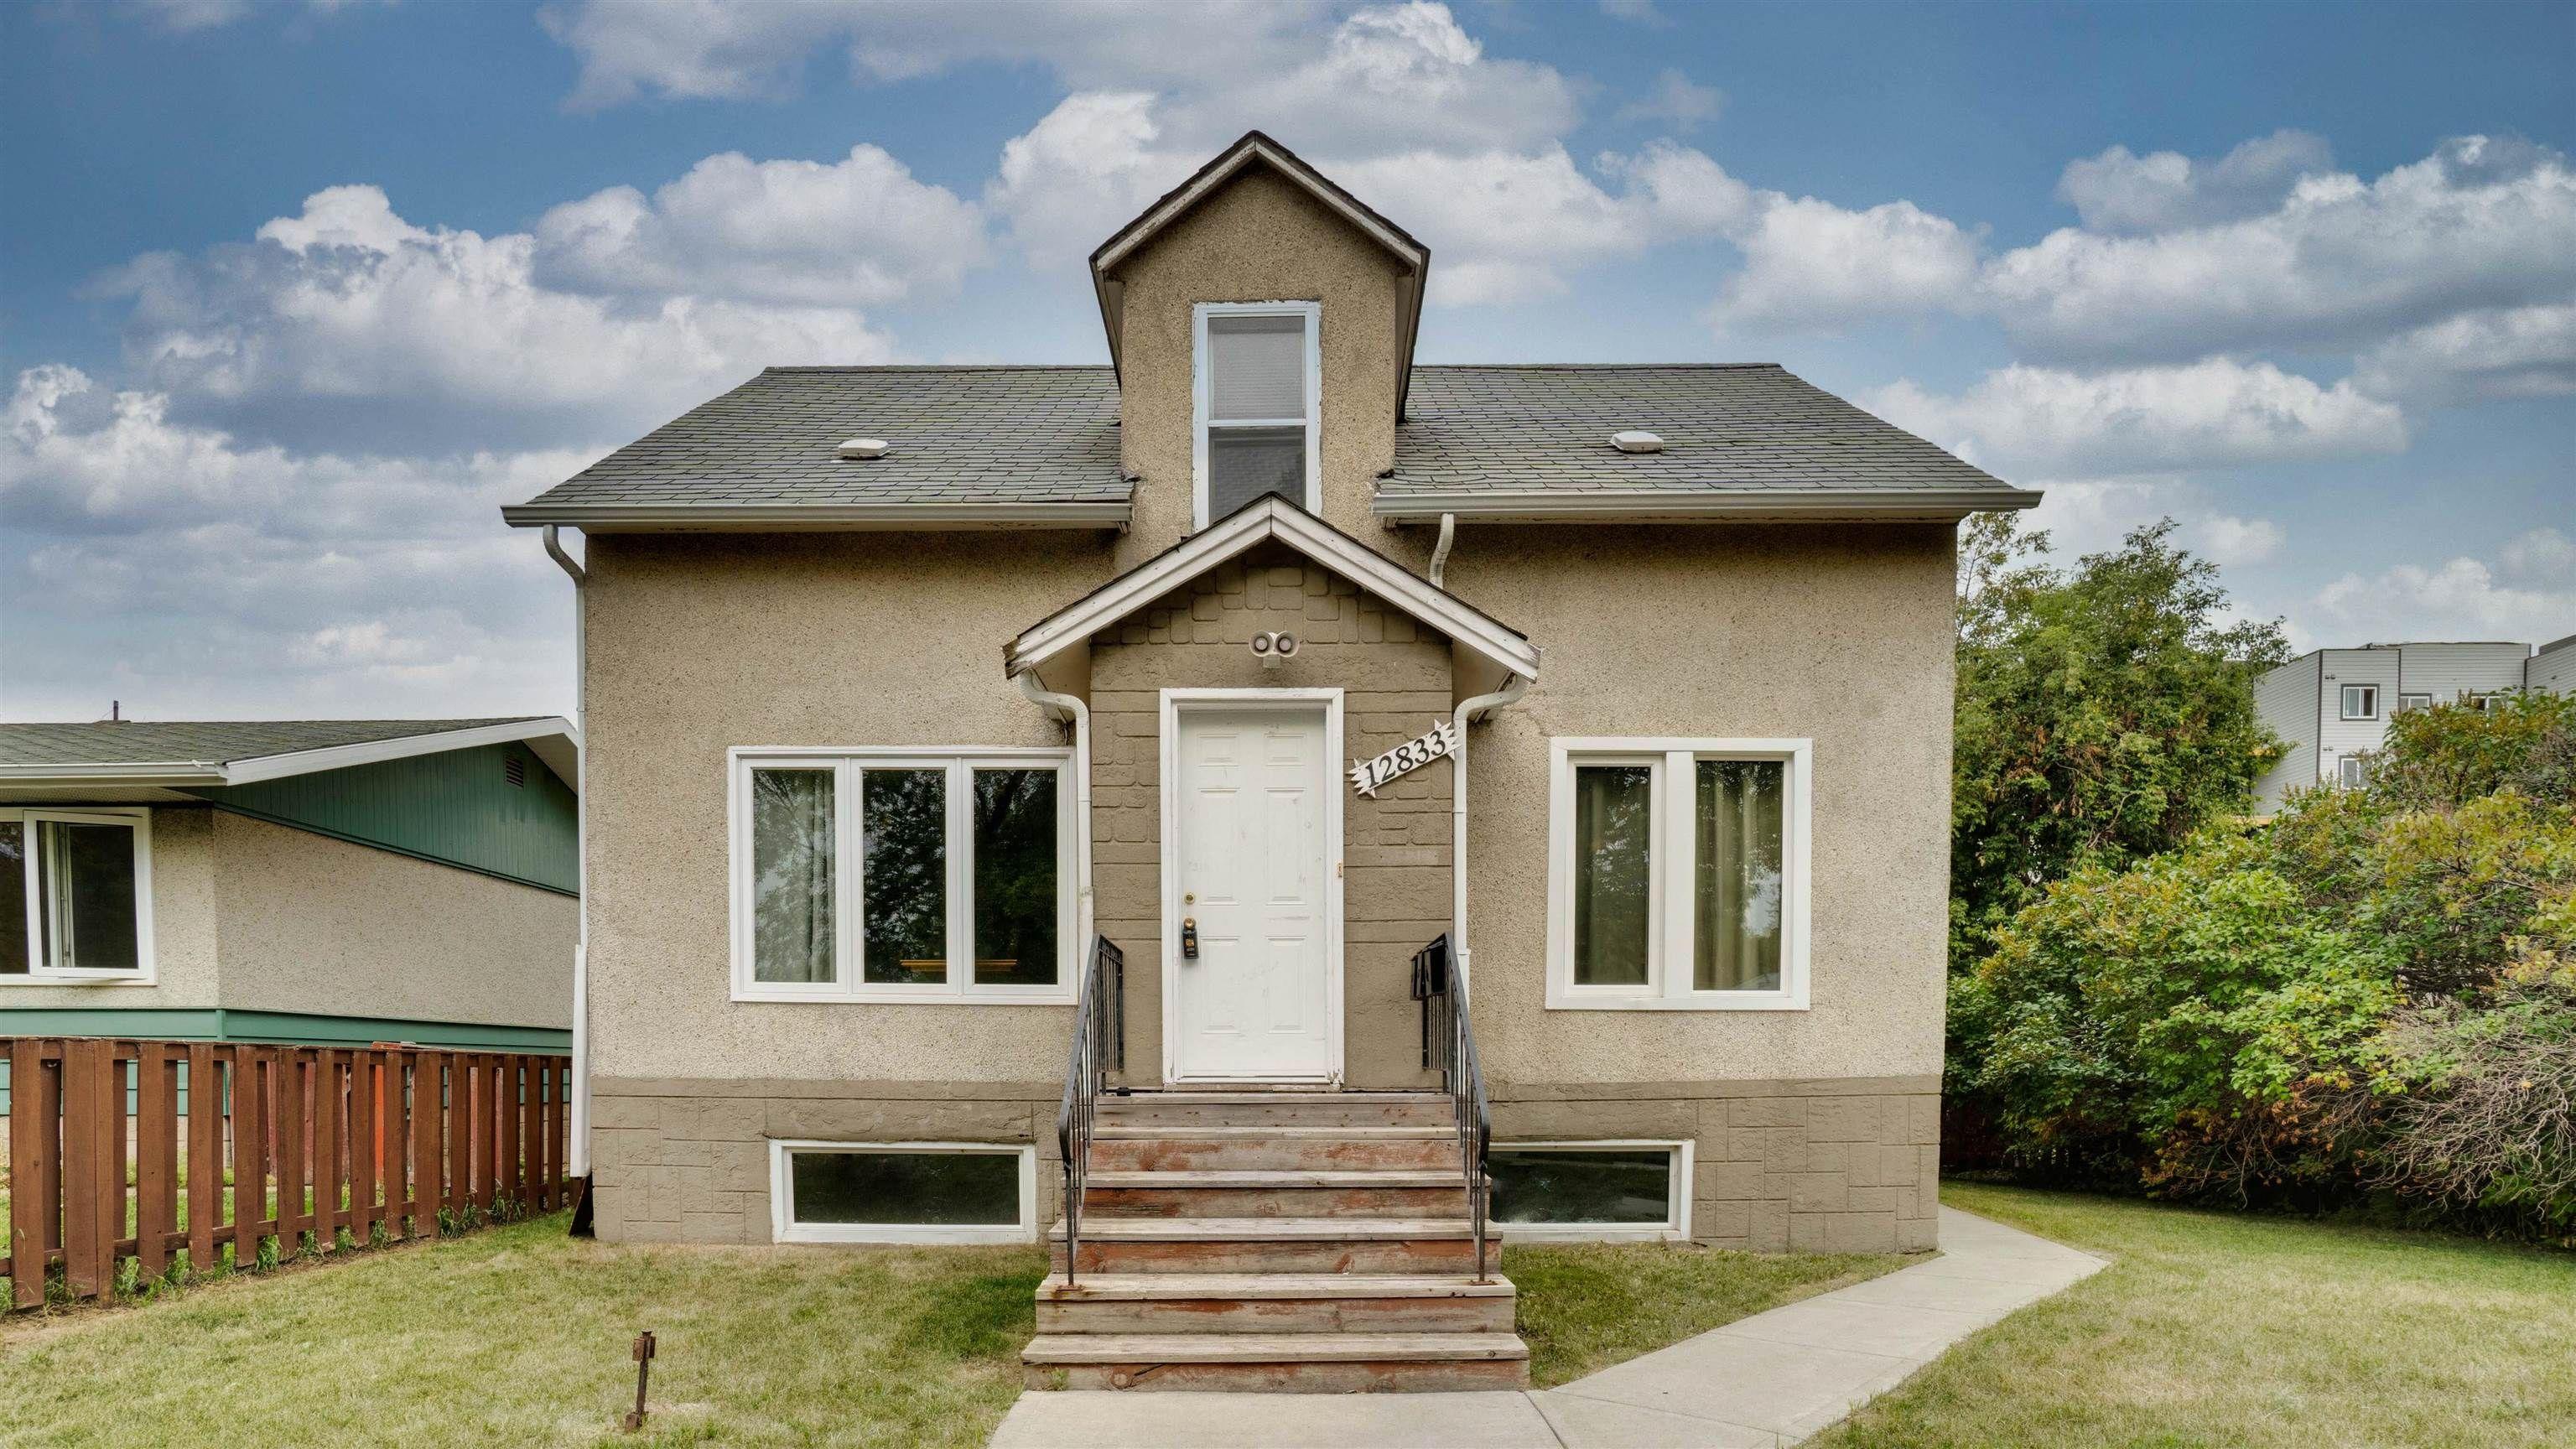 Main Photo: 12833 67 Street in Edmonton: Zone 02 House for sale : MLS®# E4260817